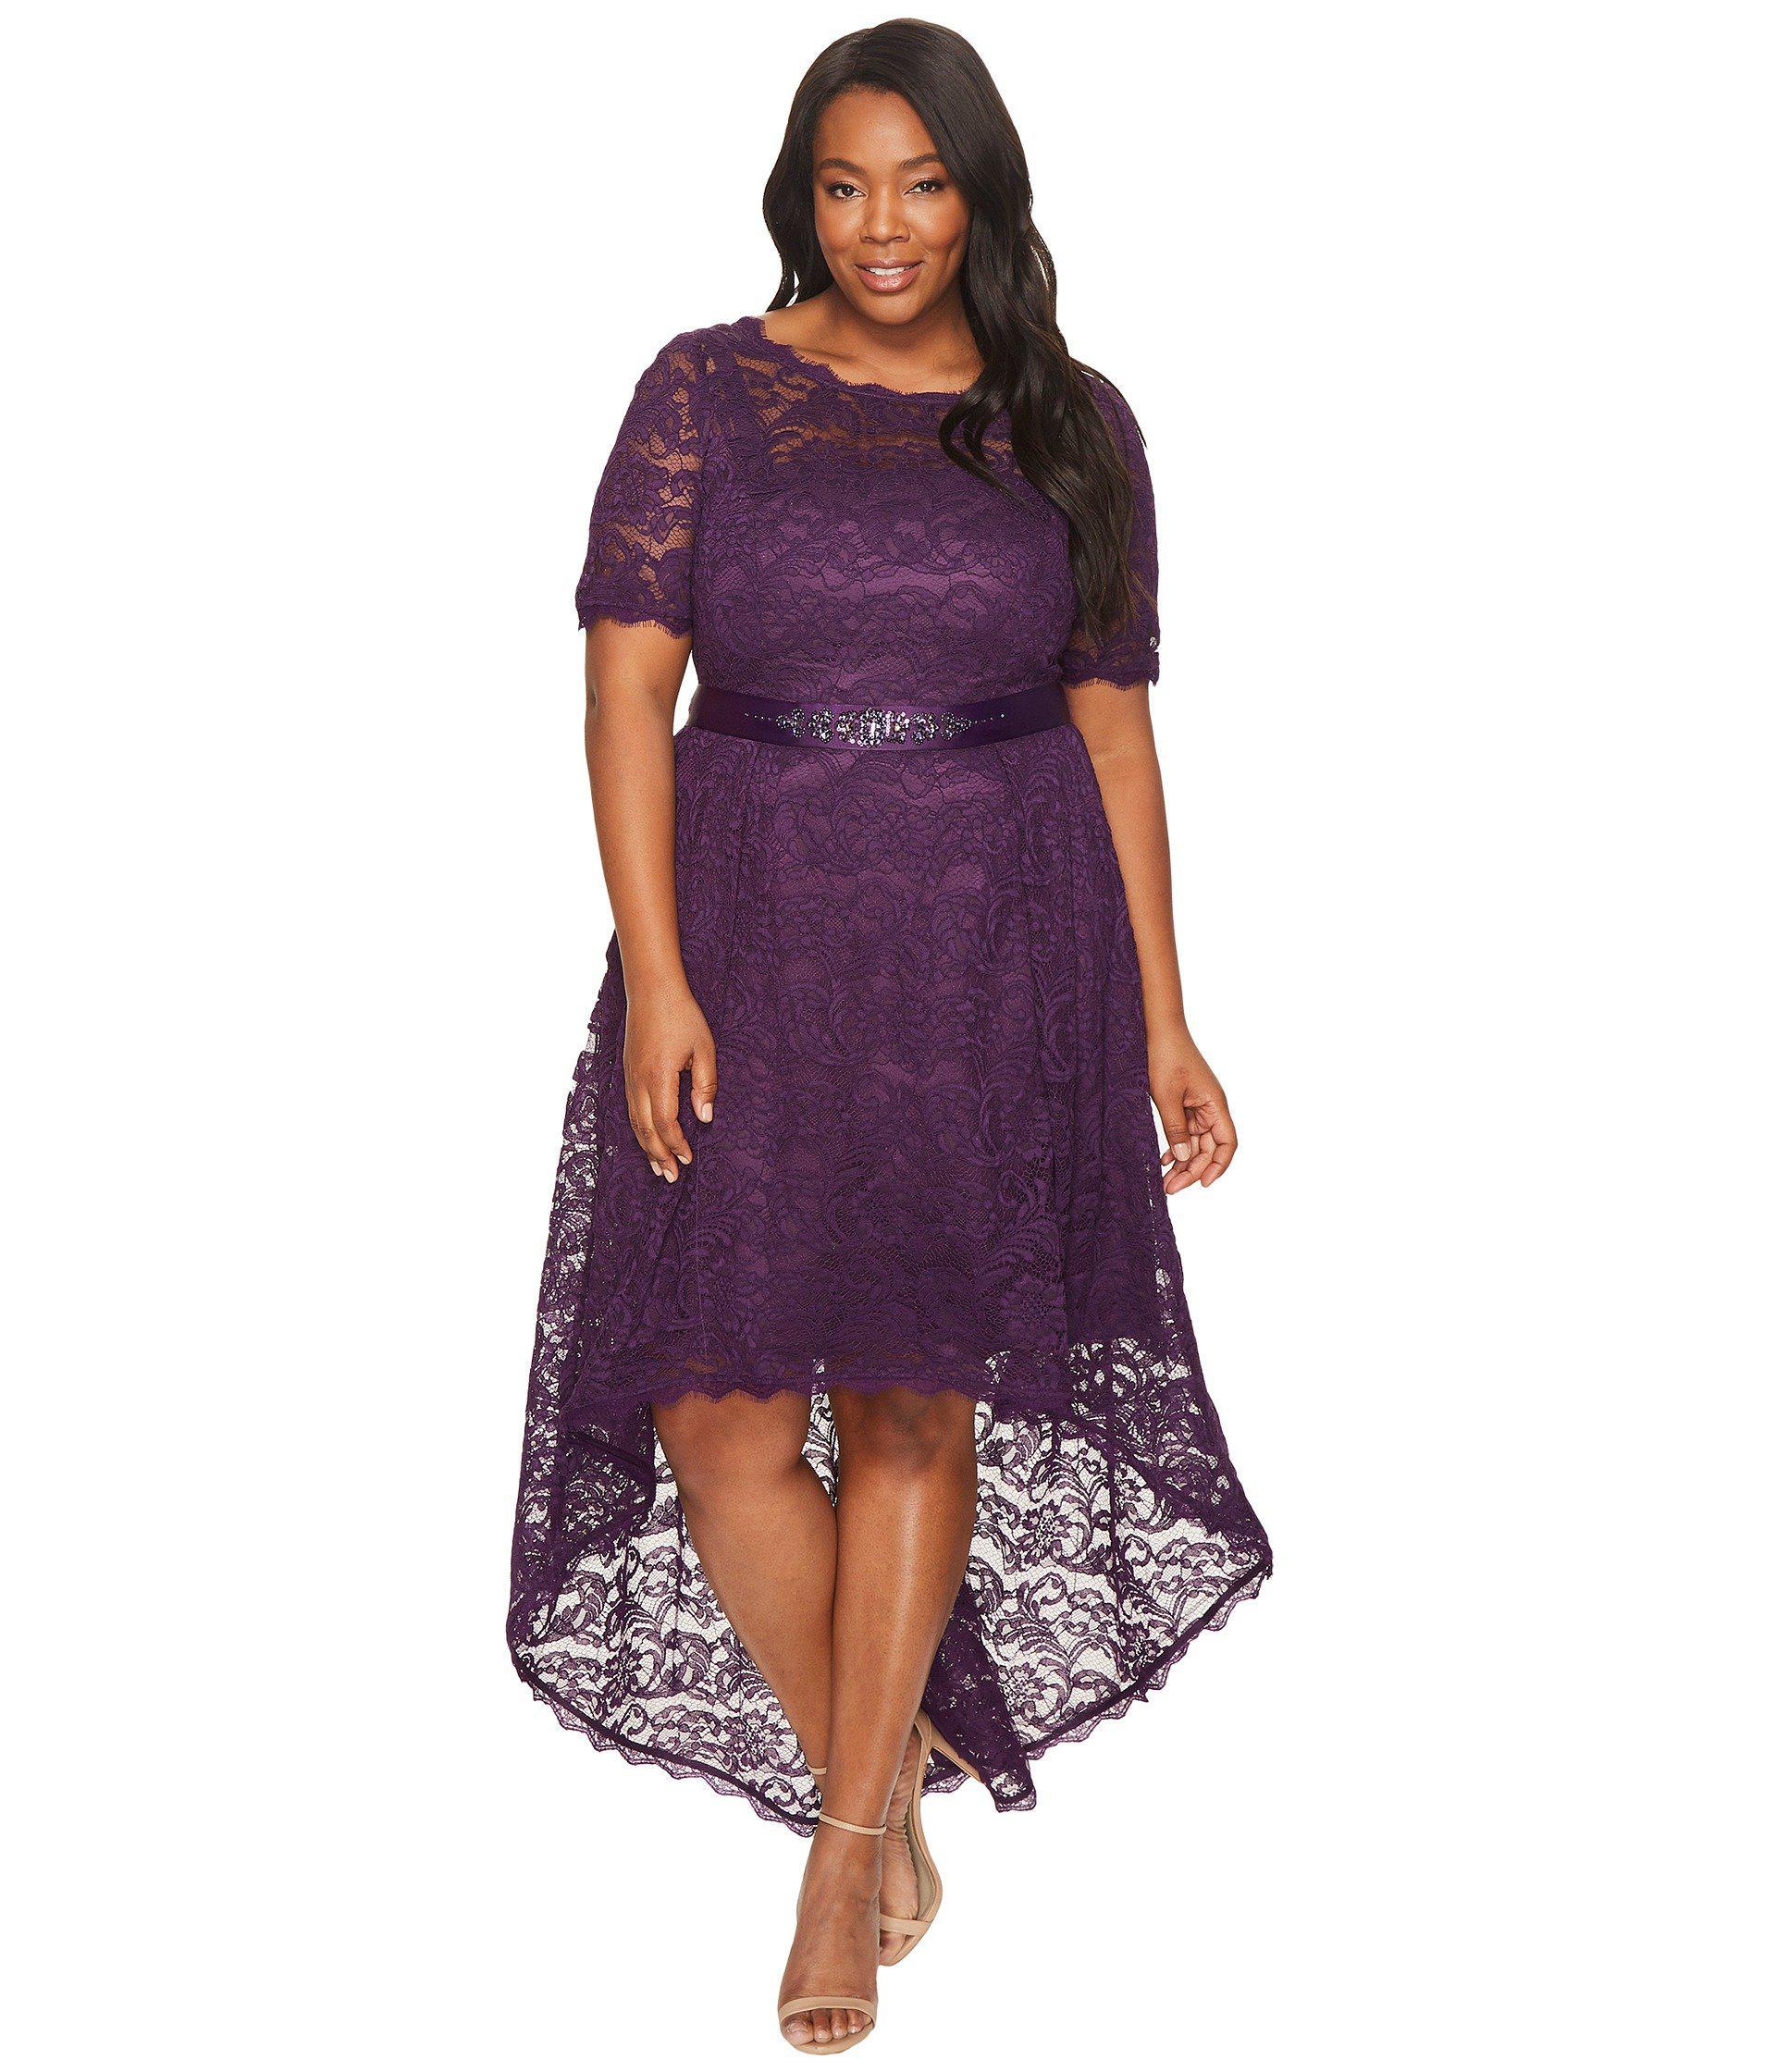 Women\'s Purple Plus Size Short Sleeve Lace Dress With High-low Hem